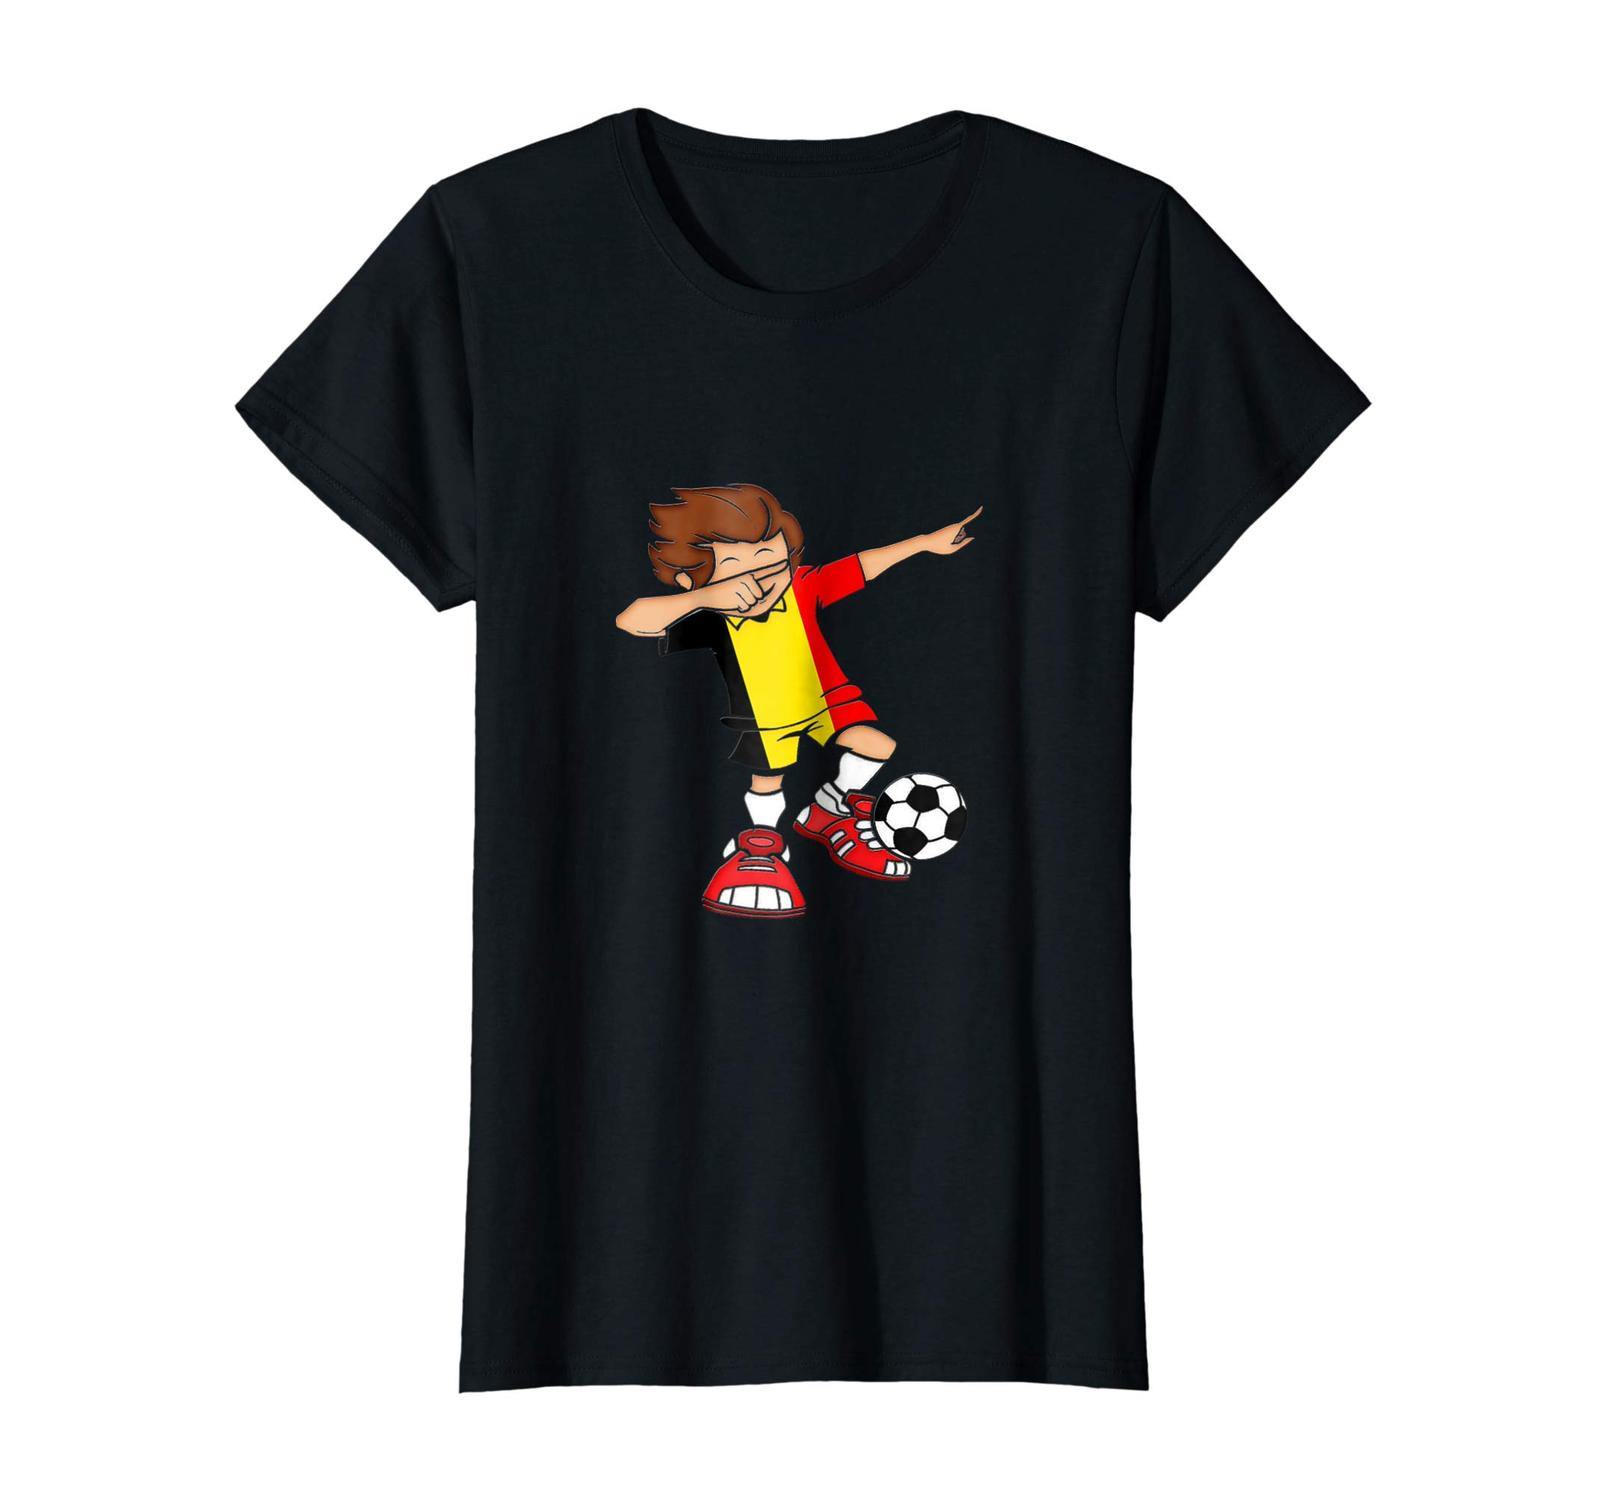 Sport Shirts - Dabbing Soccer Boy Belgium Jersey T Shirt - Belgian Football Wowe